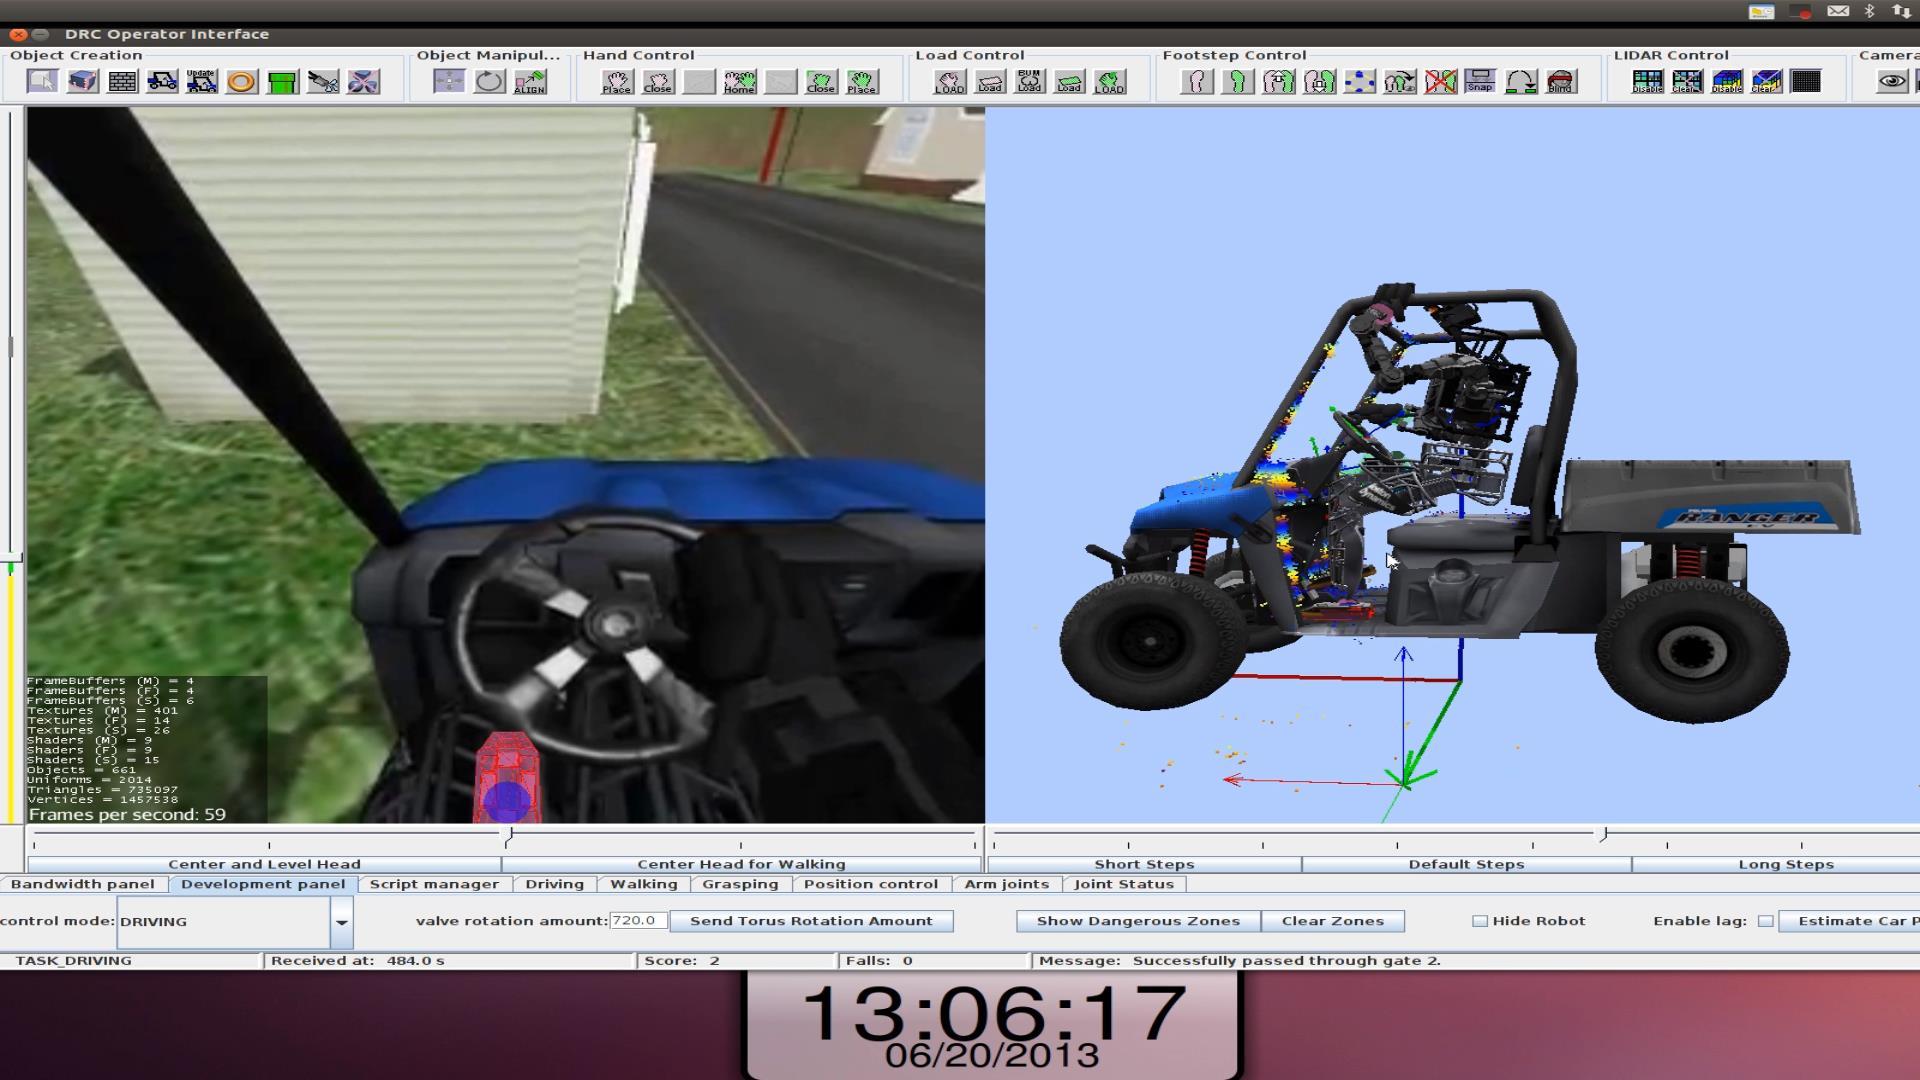 vrc_final_run12_driving (Subclip4).jpg